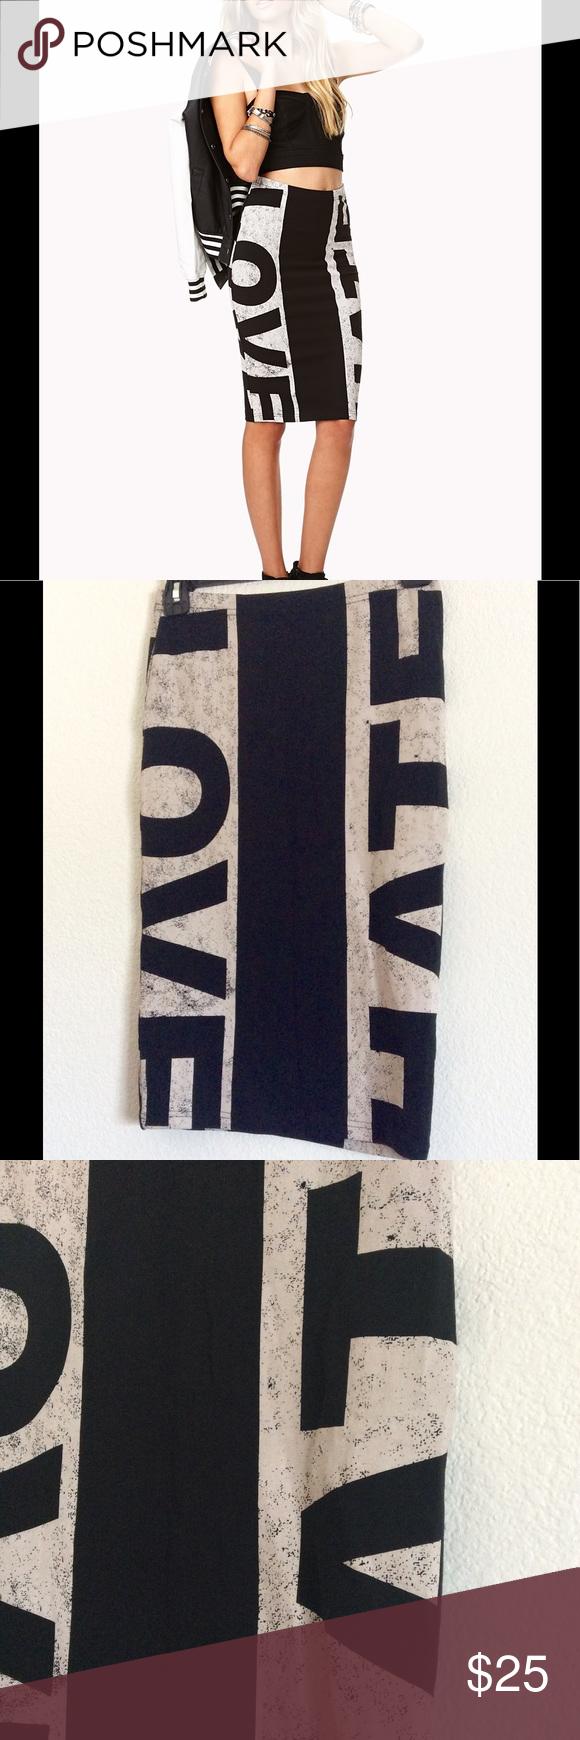 Forever 21 Love Hate BodyCon Midi Skirt NWOT Size Small 97% Cotton 3% Elastane Skirts Pencil